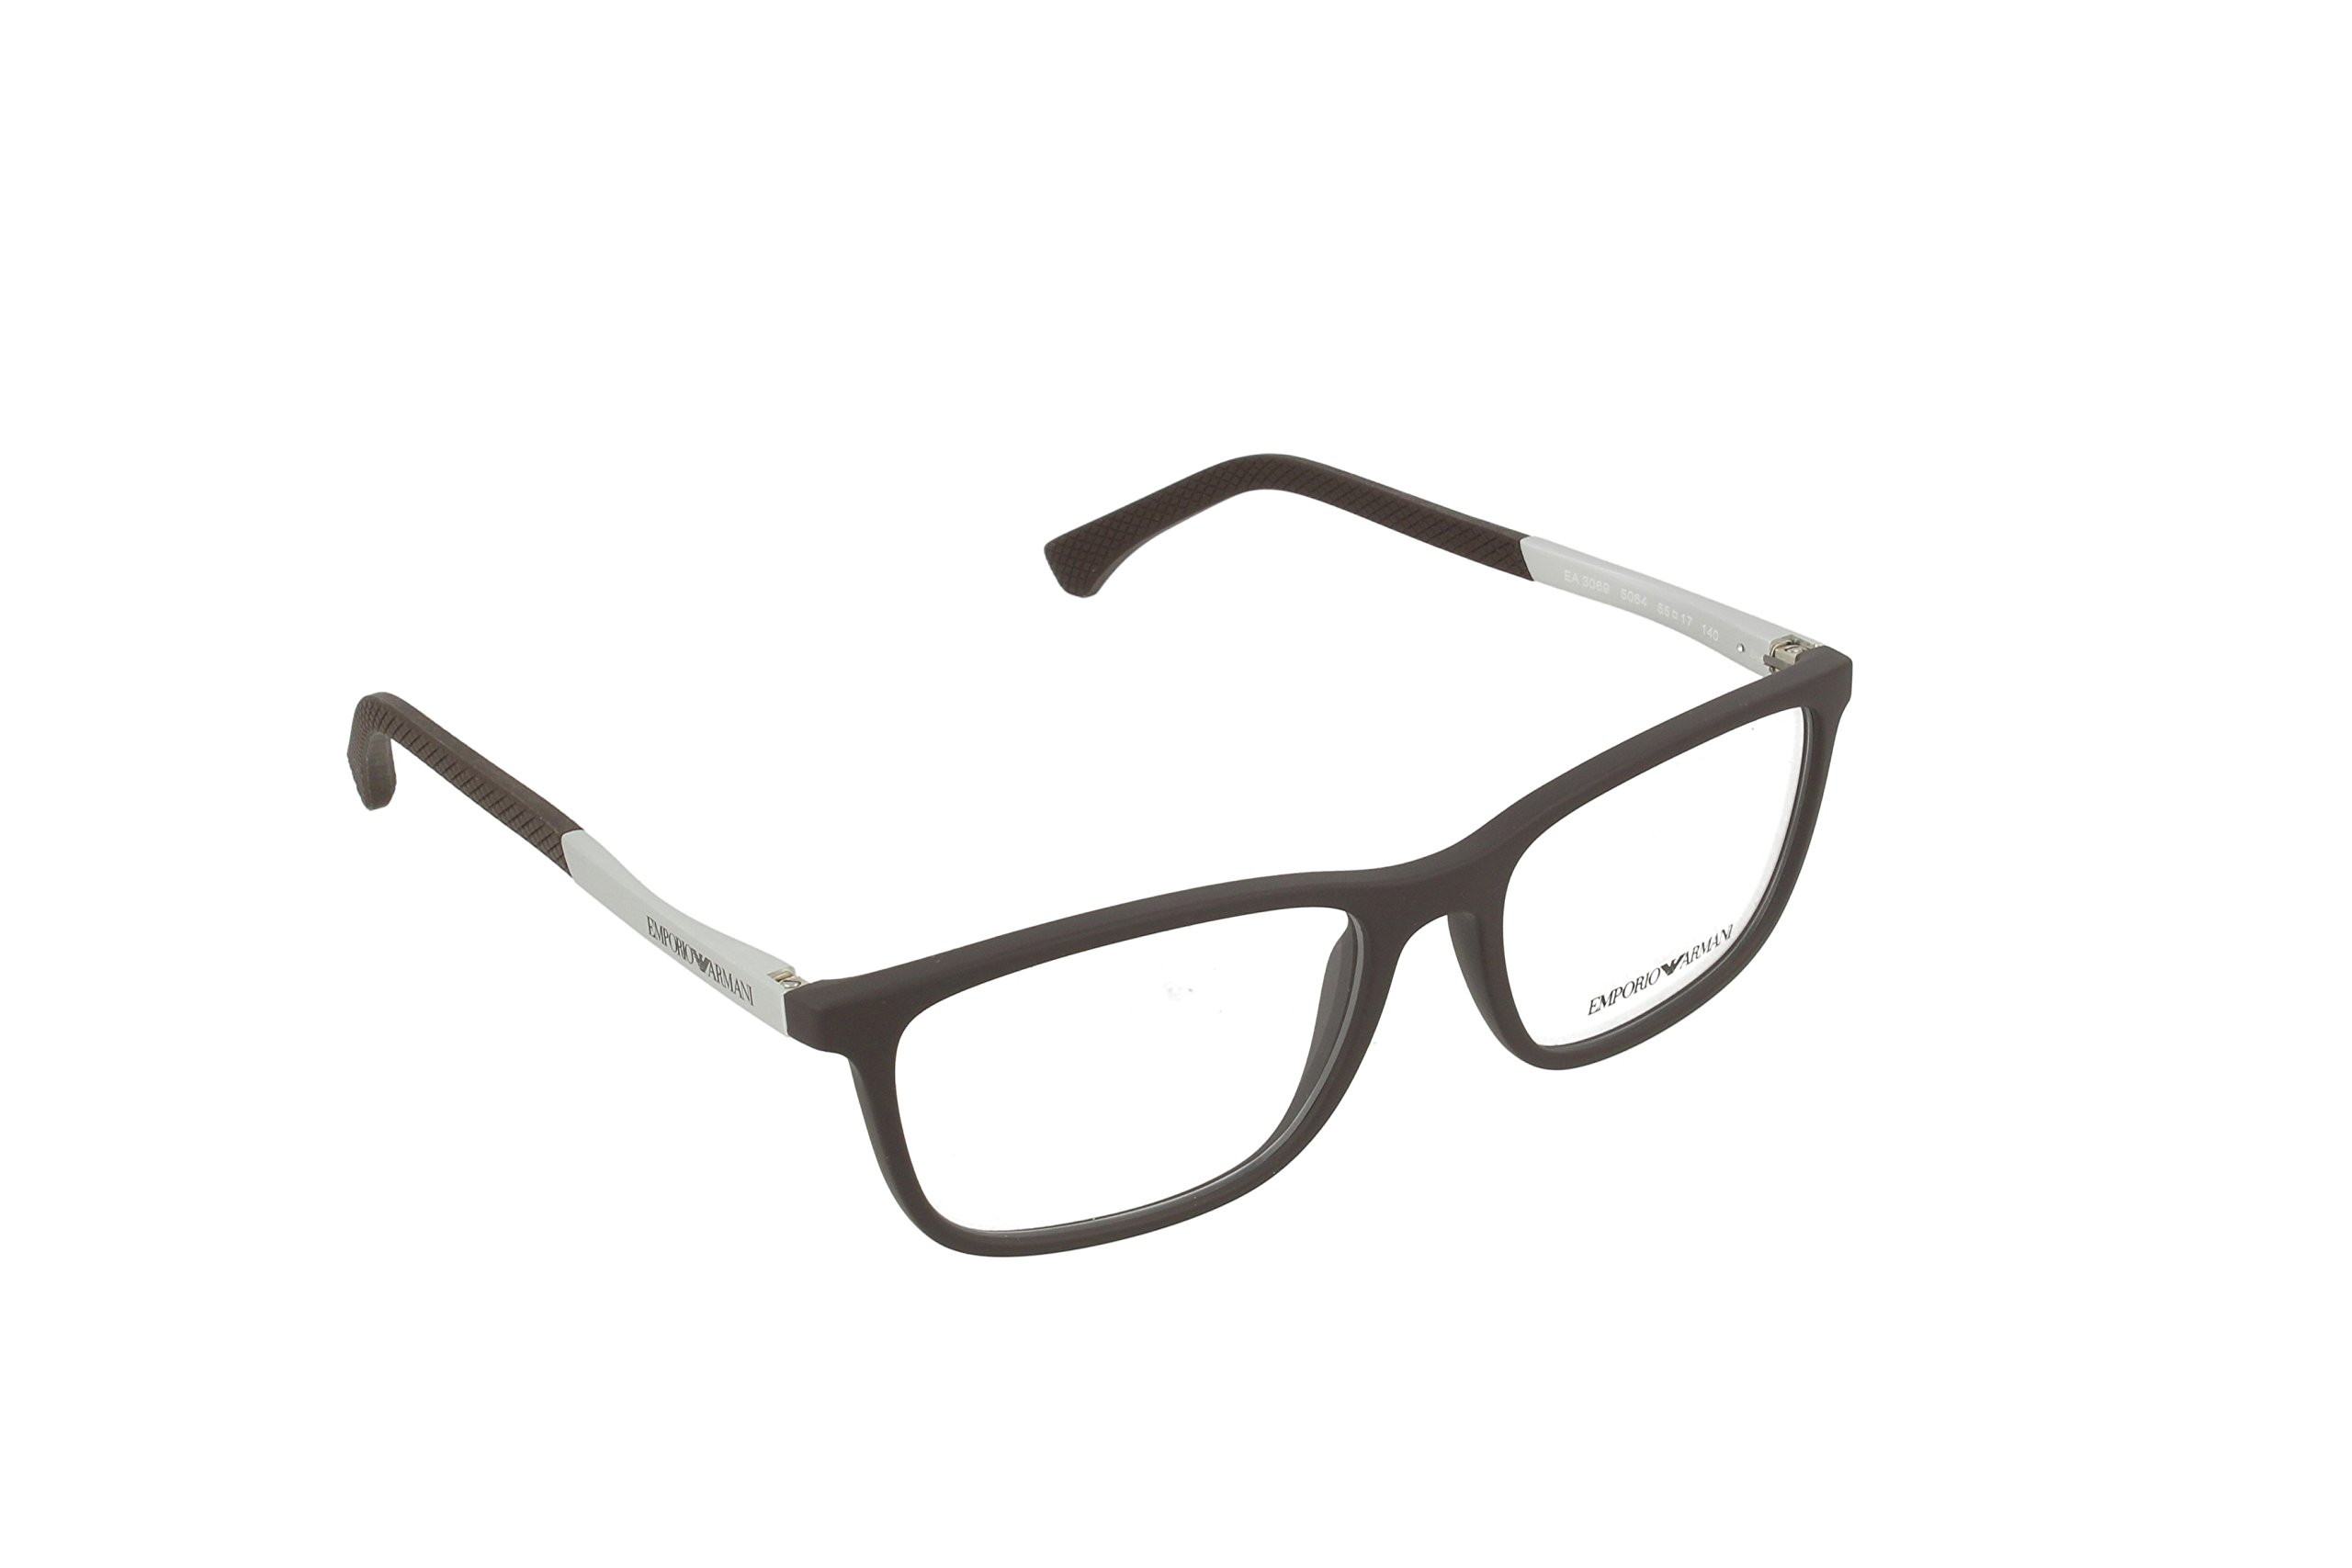 Armani EA3069 Eyeglass Frames 5064-55 - Brown Rubber